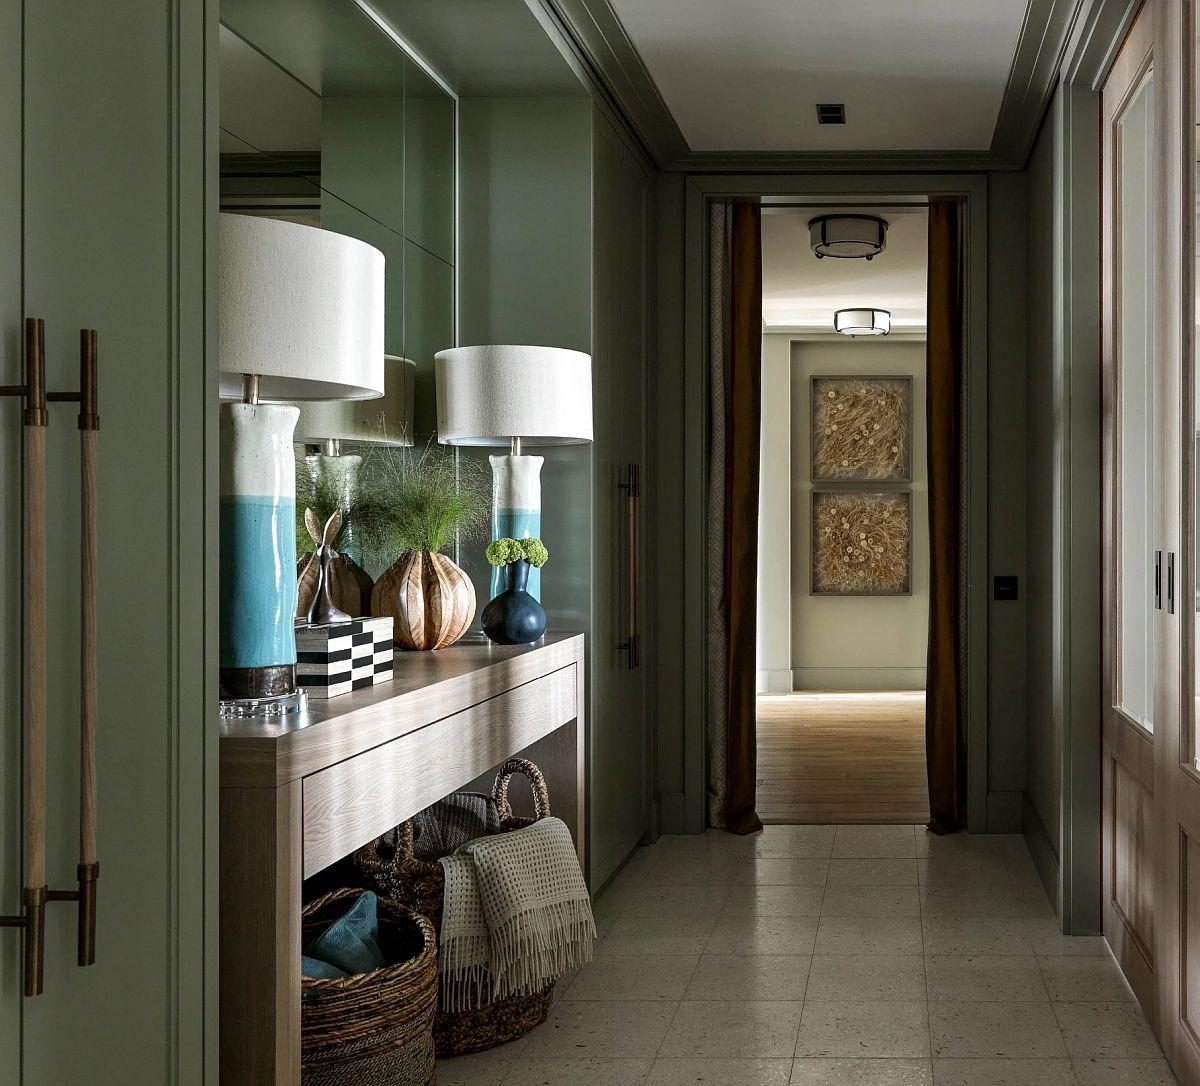 adelaparvu.com despre apartament 196 mp, designer Anna Pavlovskaya, Foto Serghei Krasyuk (12)